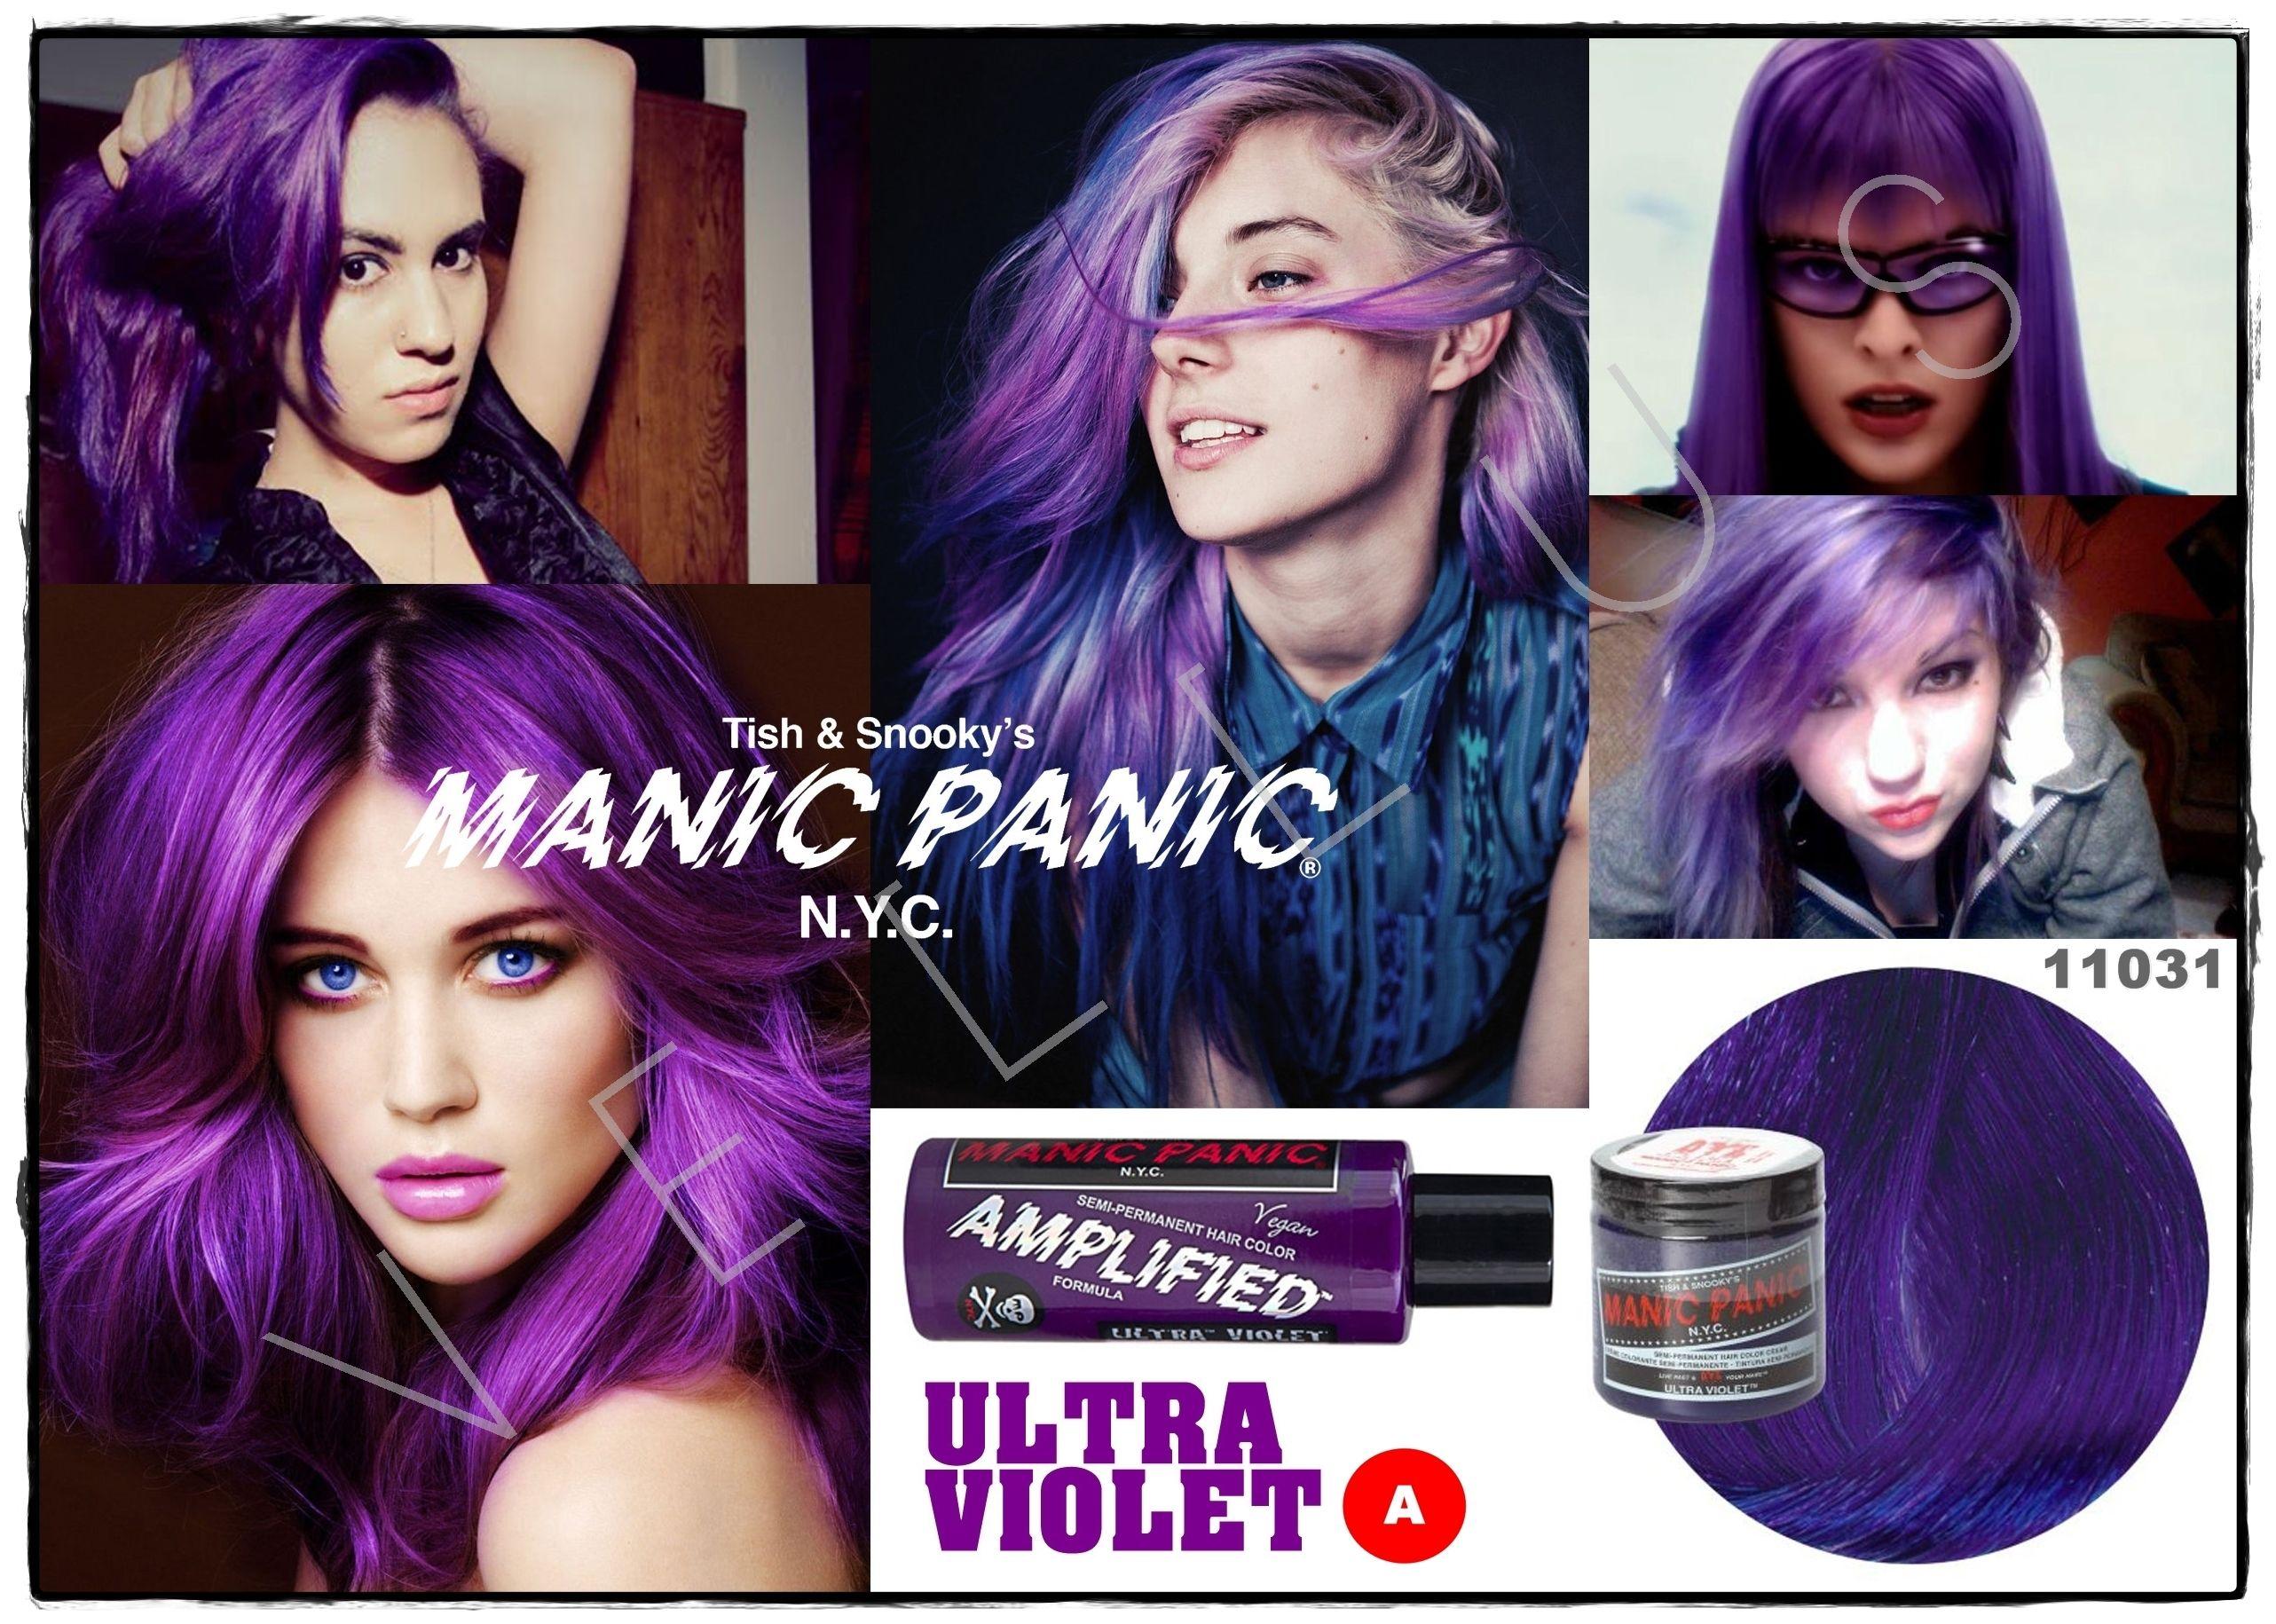 Manic Panic Amplified Ultra Violet Vellus Hair Studio 83a Tanjong Pagar Road S 088504 Tel 62246566 Manic Panic Hair Dye Lilac Hair Hair Studio